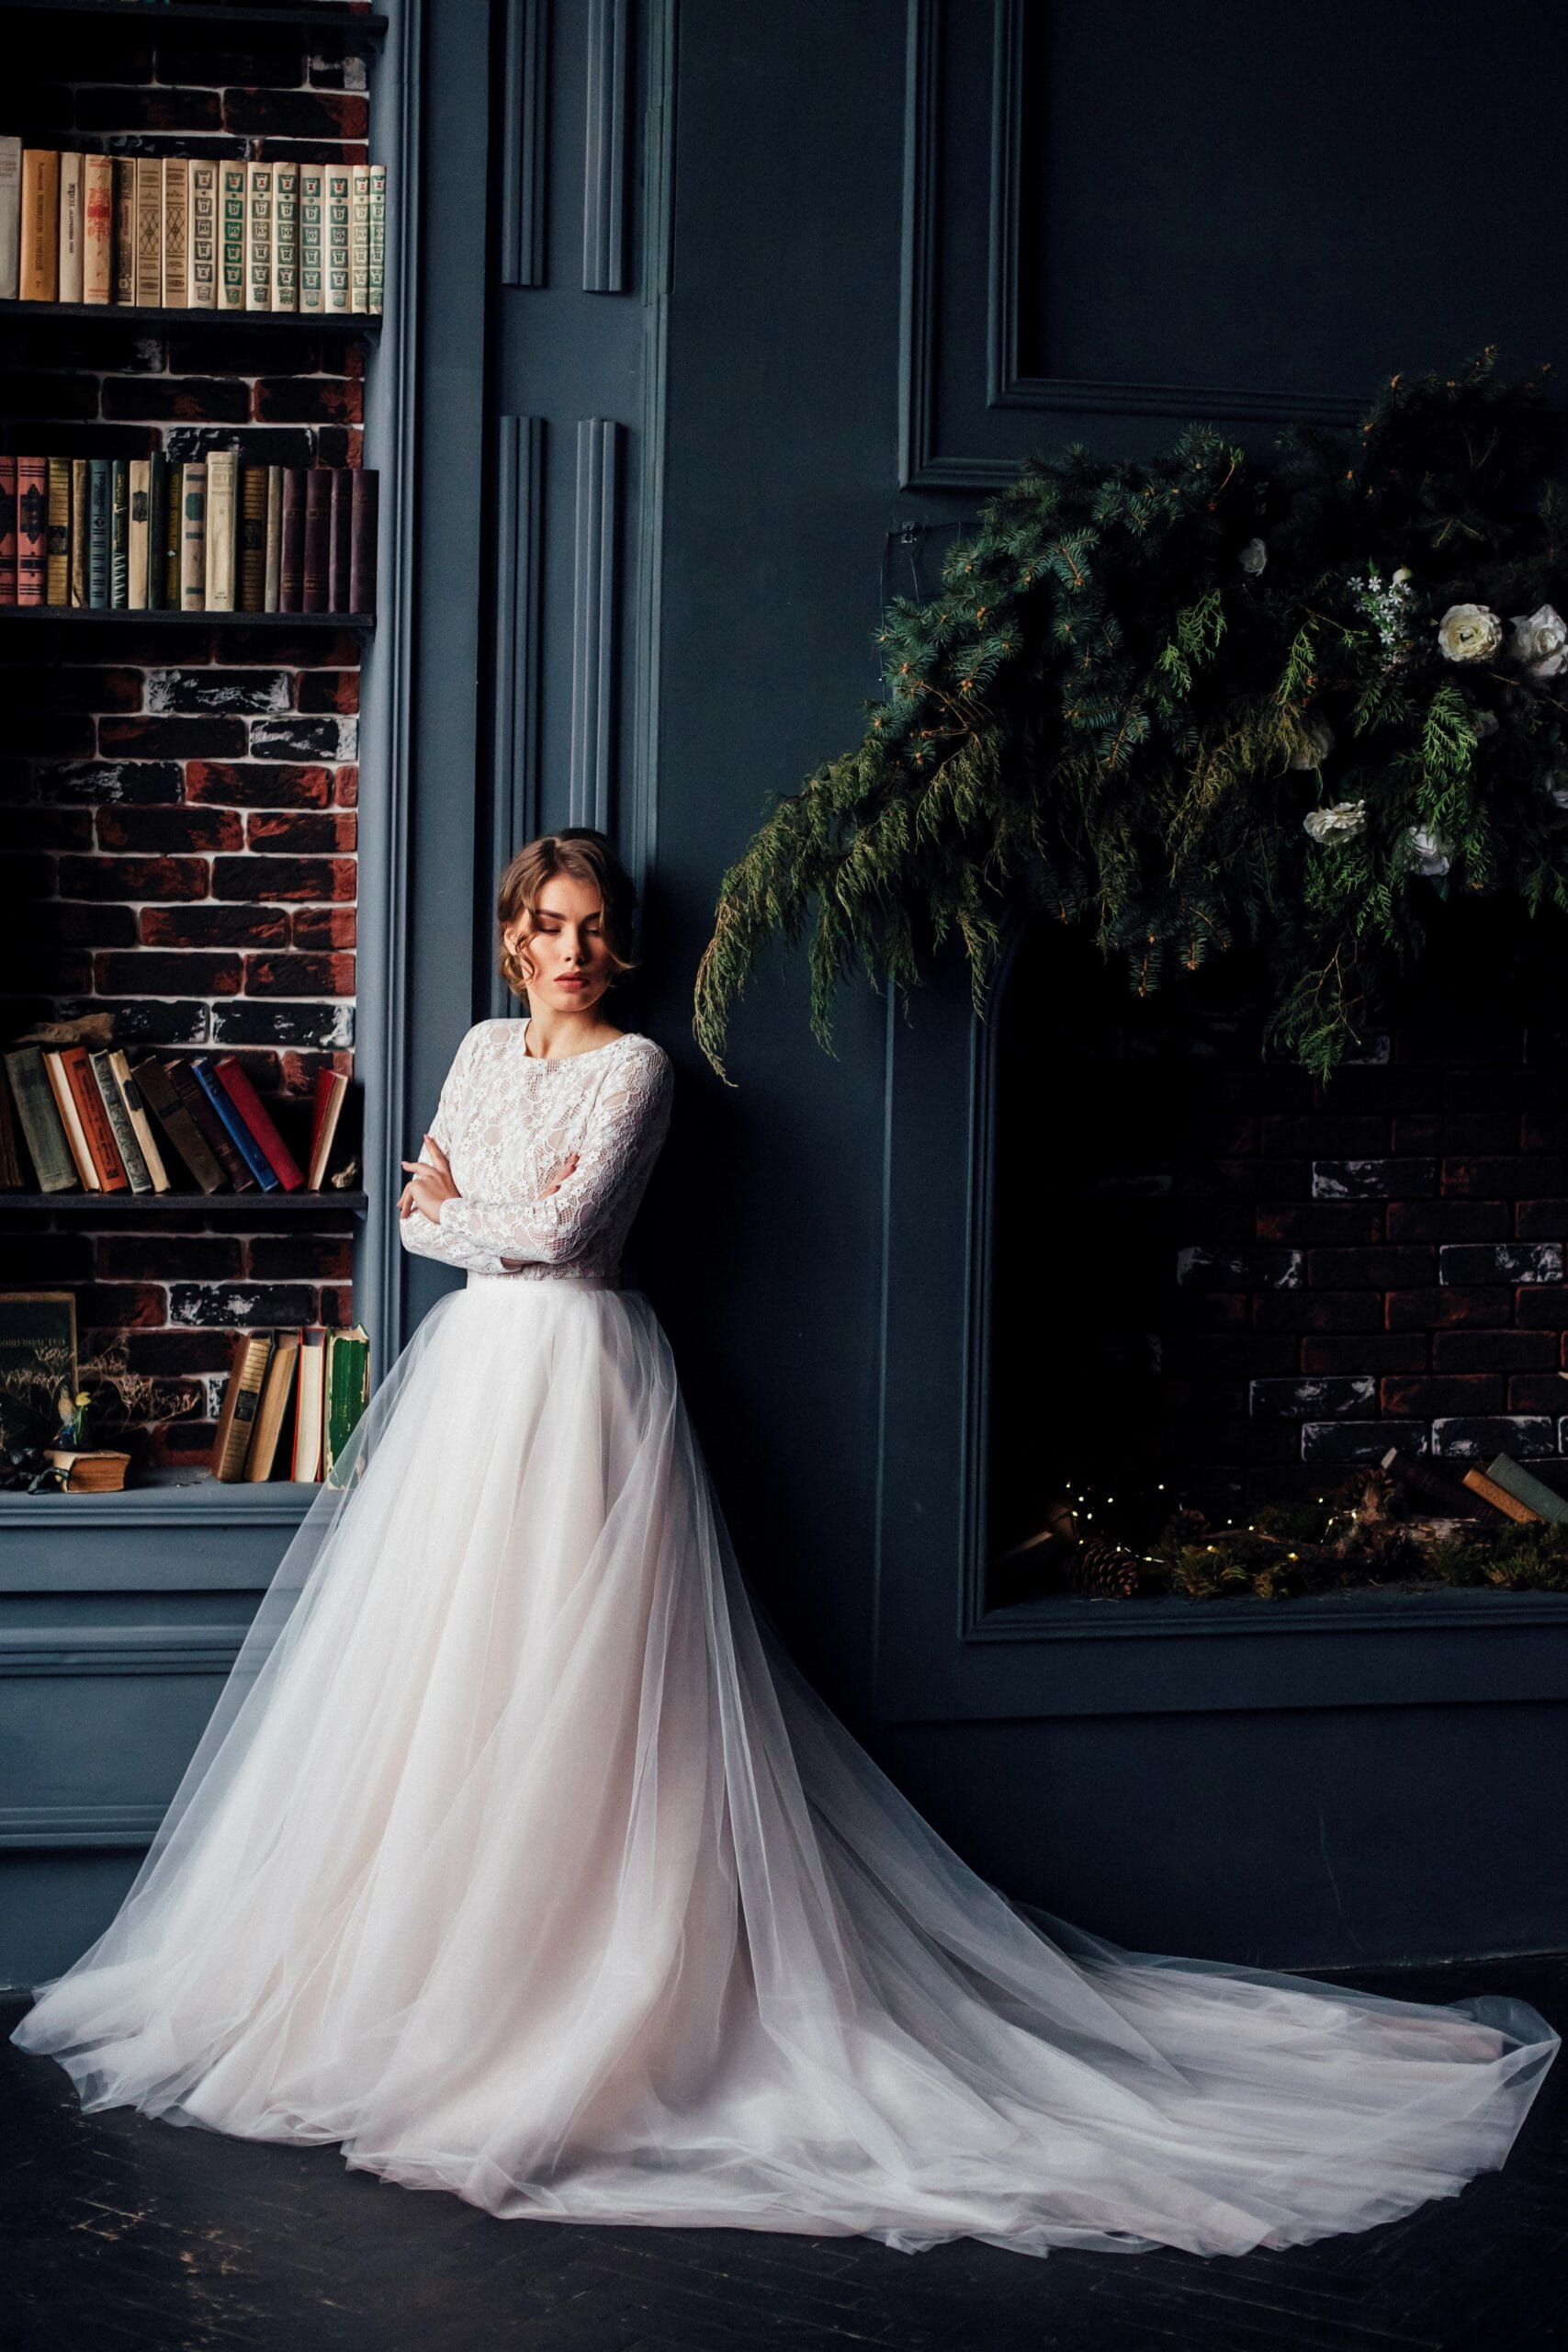 Свадебное платье PENELOPE, коллекция THE ABSOLUTE LOVE, бренд RARE BRIDAL, фото 4